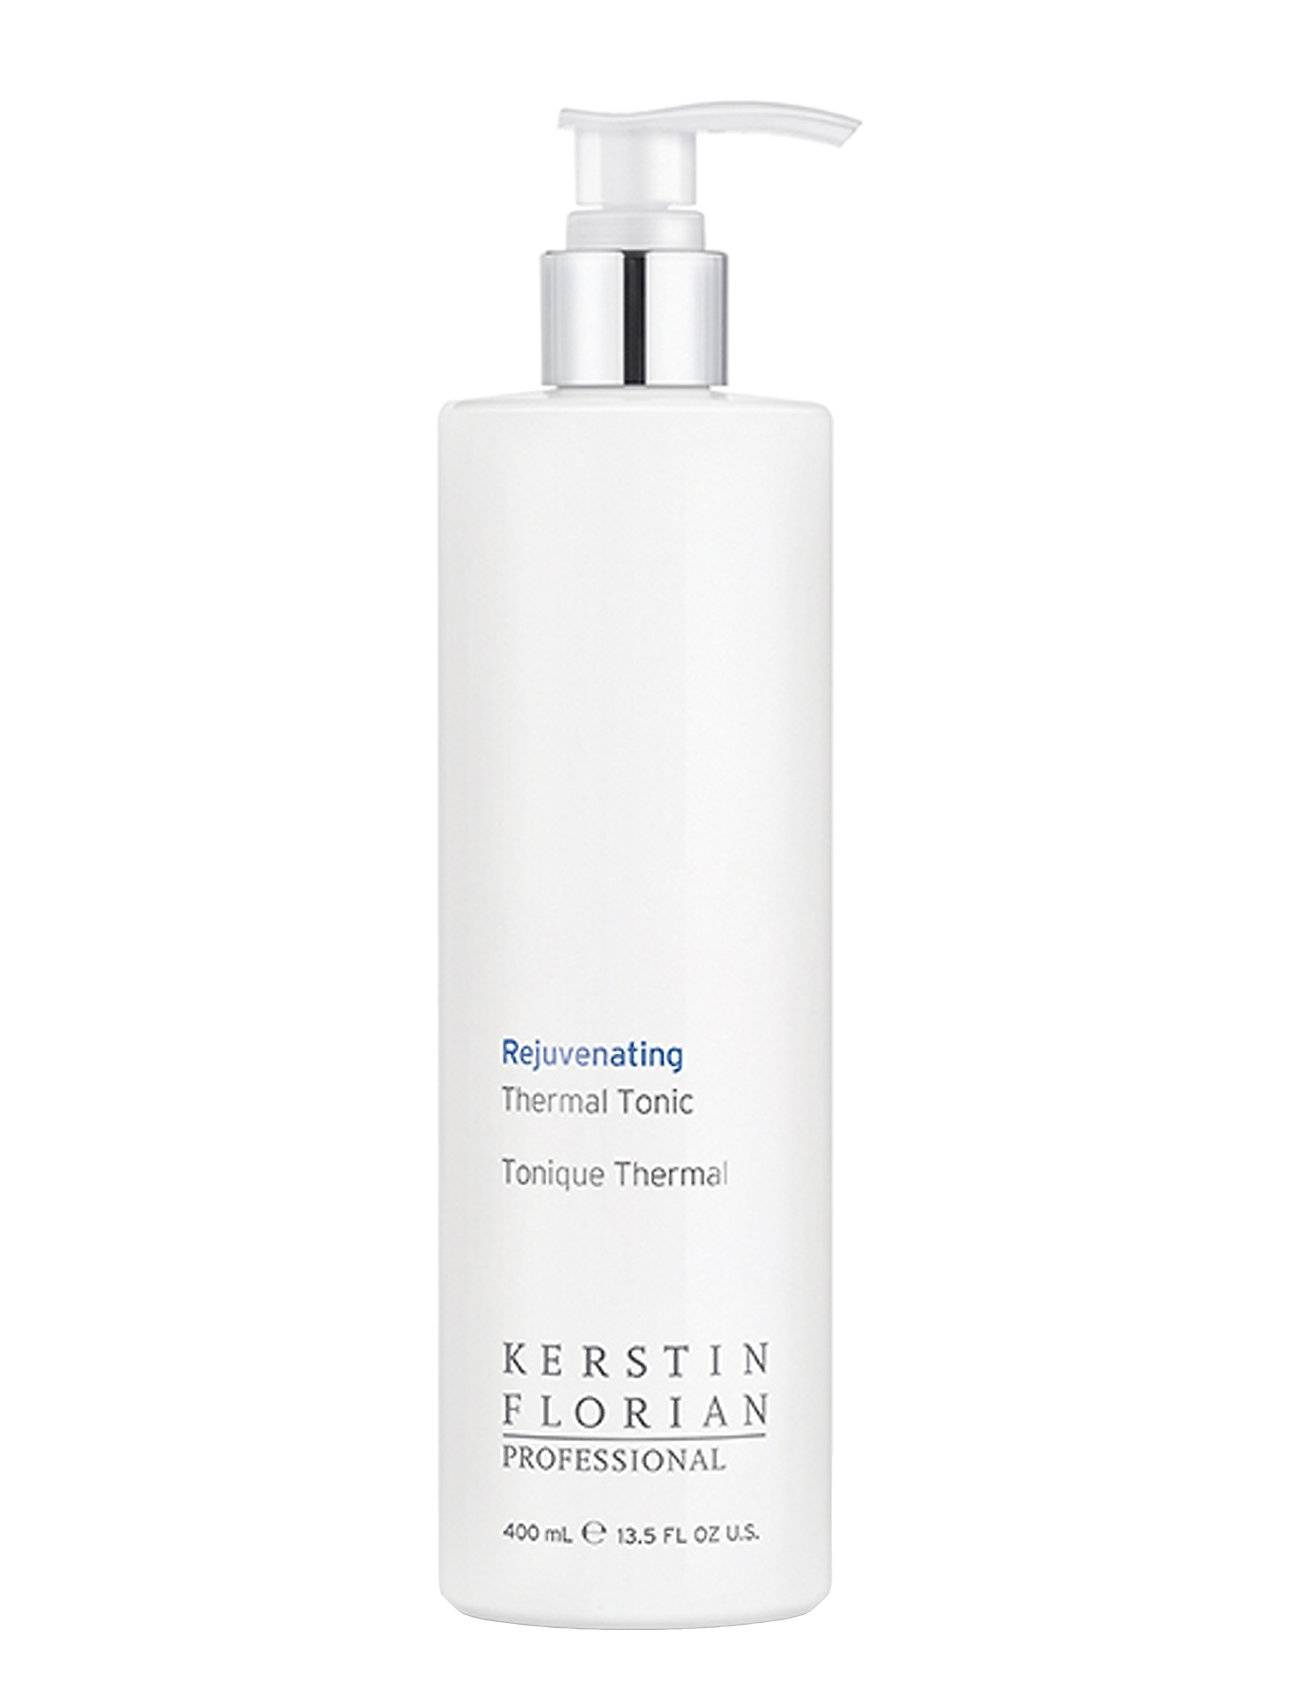 Kerstin Florian Rejuvenating Thermal Tonic